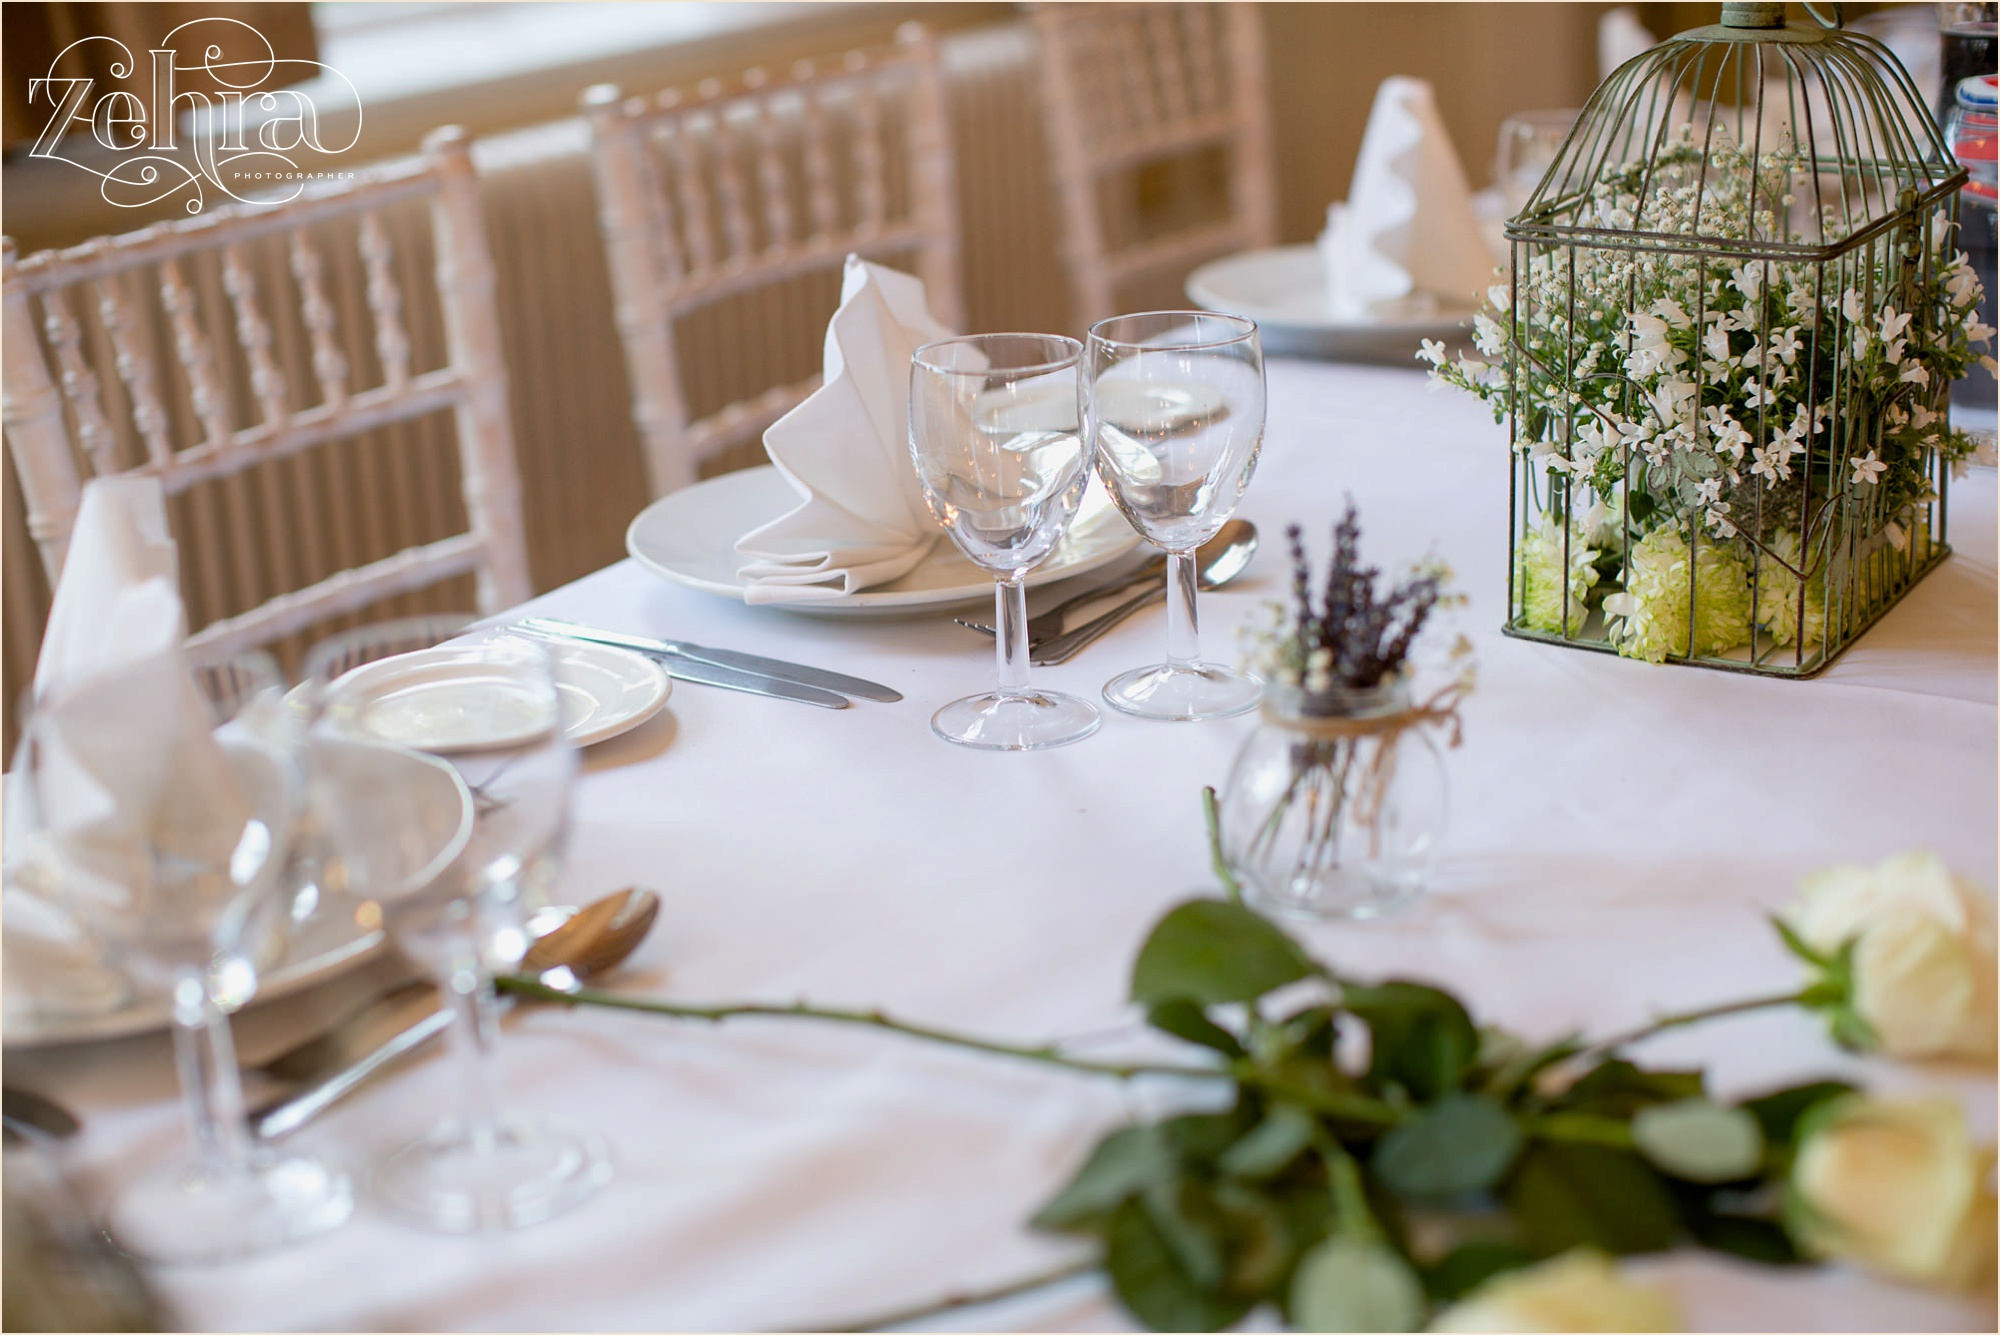 jasira manchester wedding photographer_0092.jpg